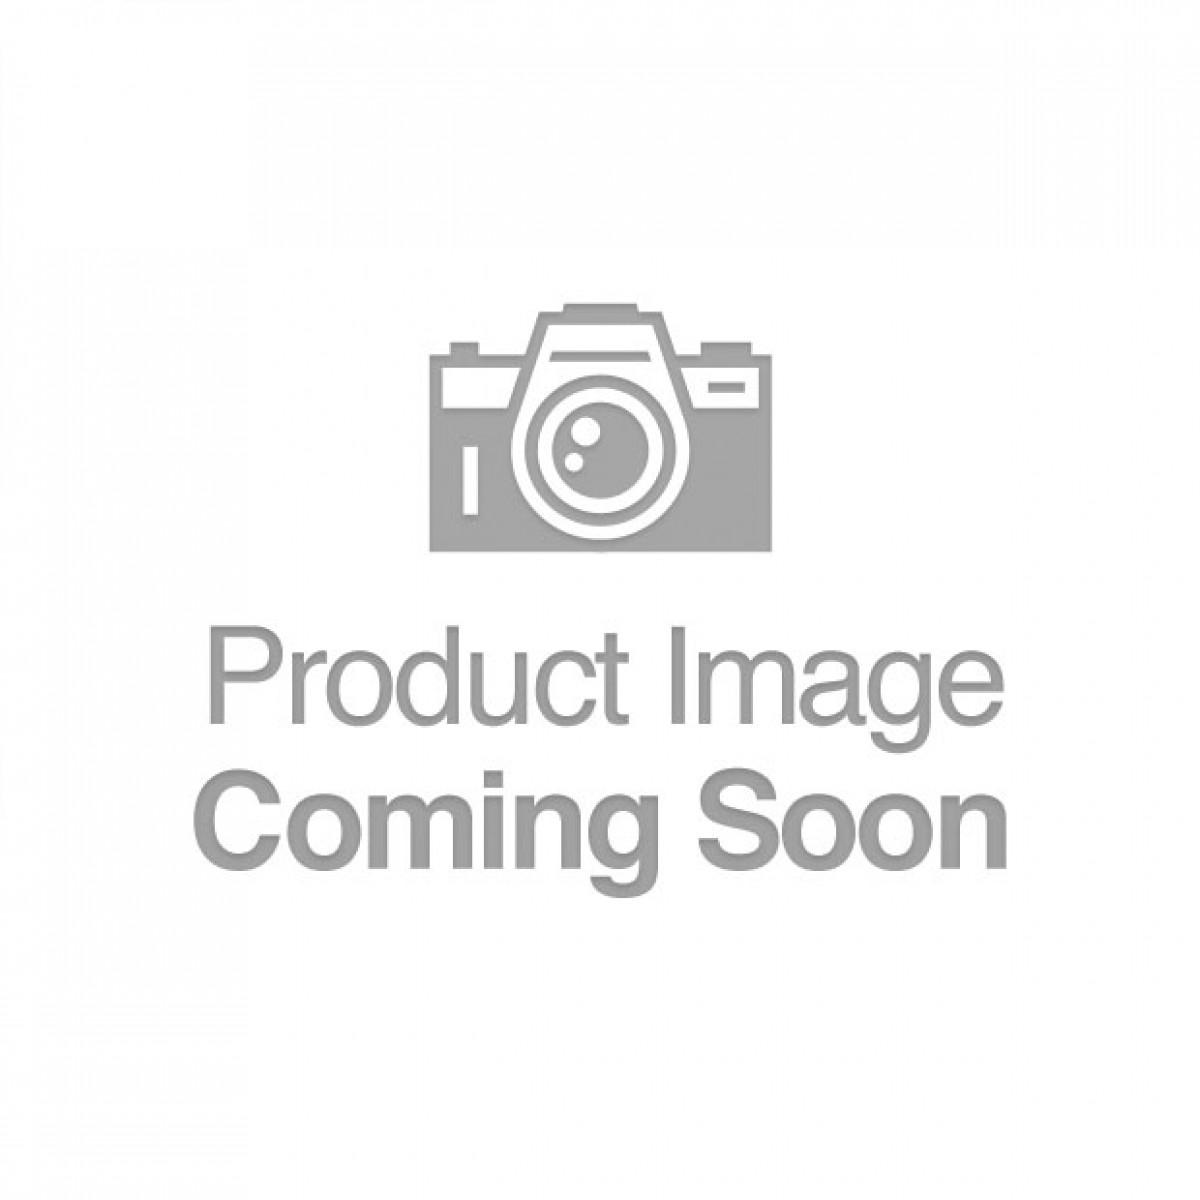 Oxballs Ergo Buttplug Large - Platinum Swirl